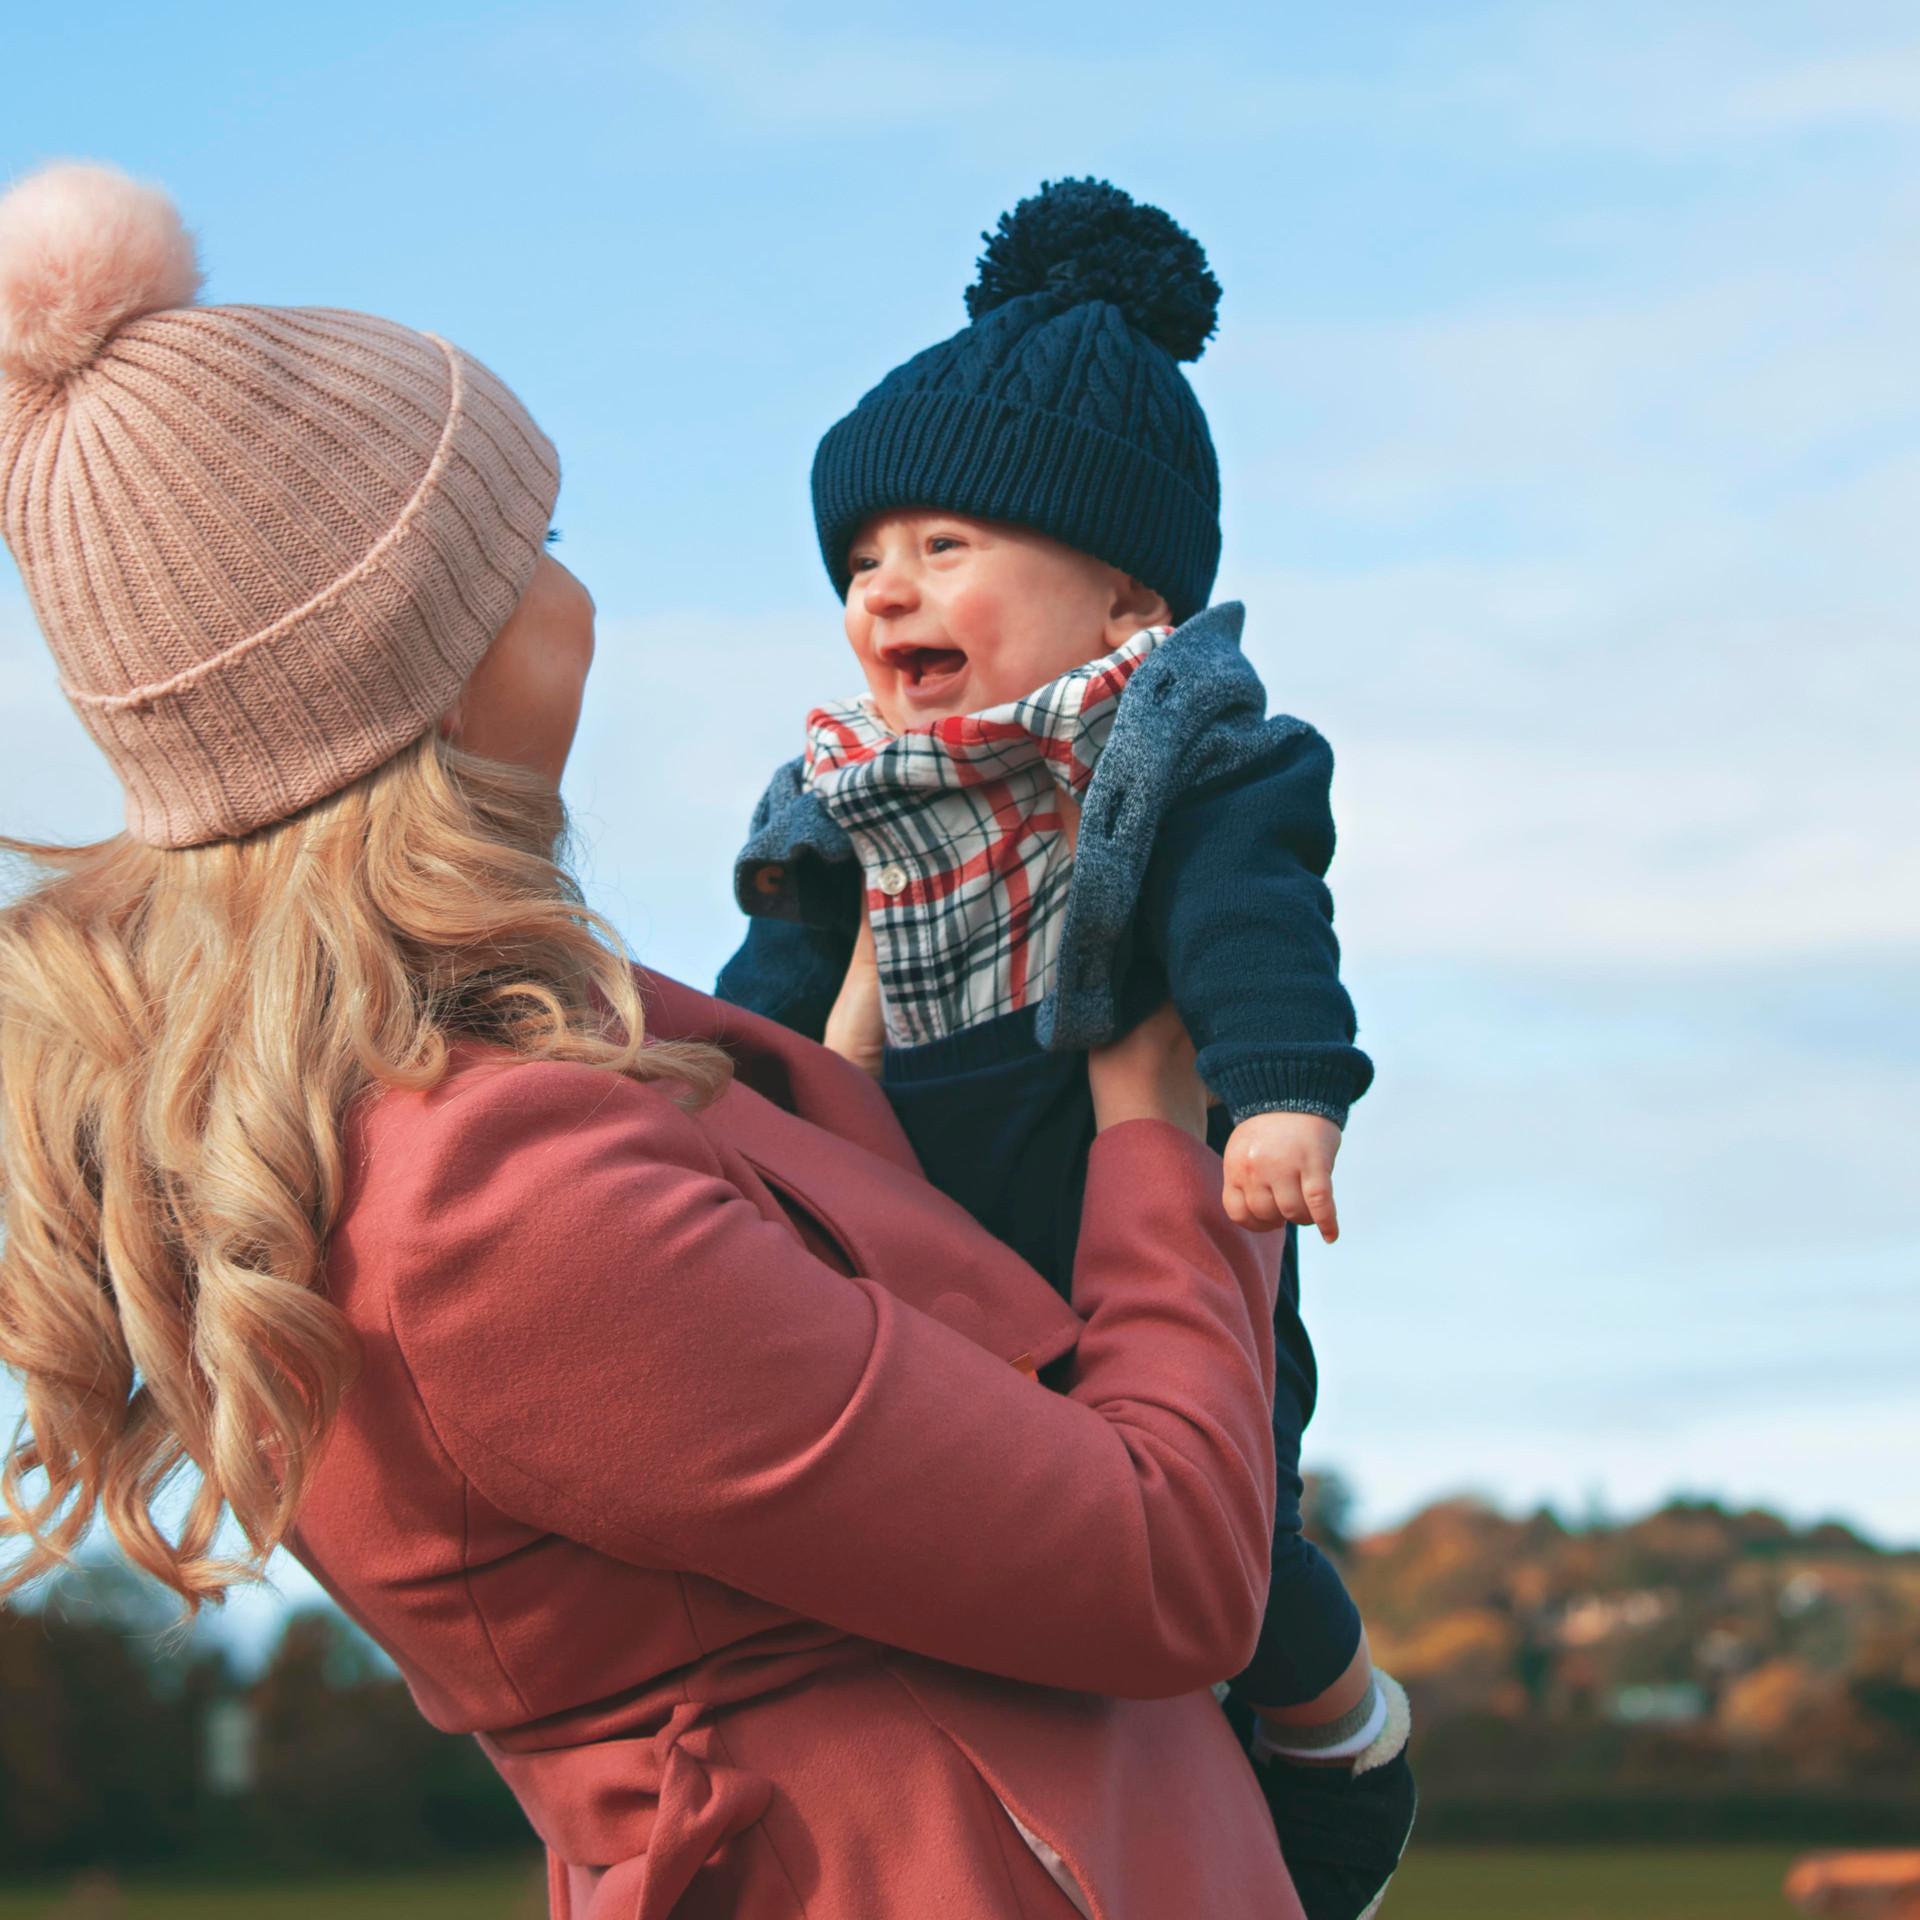 Lovely Mummy & Son Portraits at the Pumpkin Fields